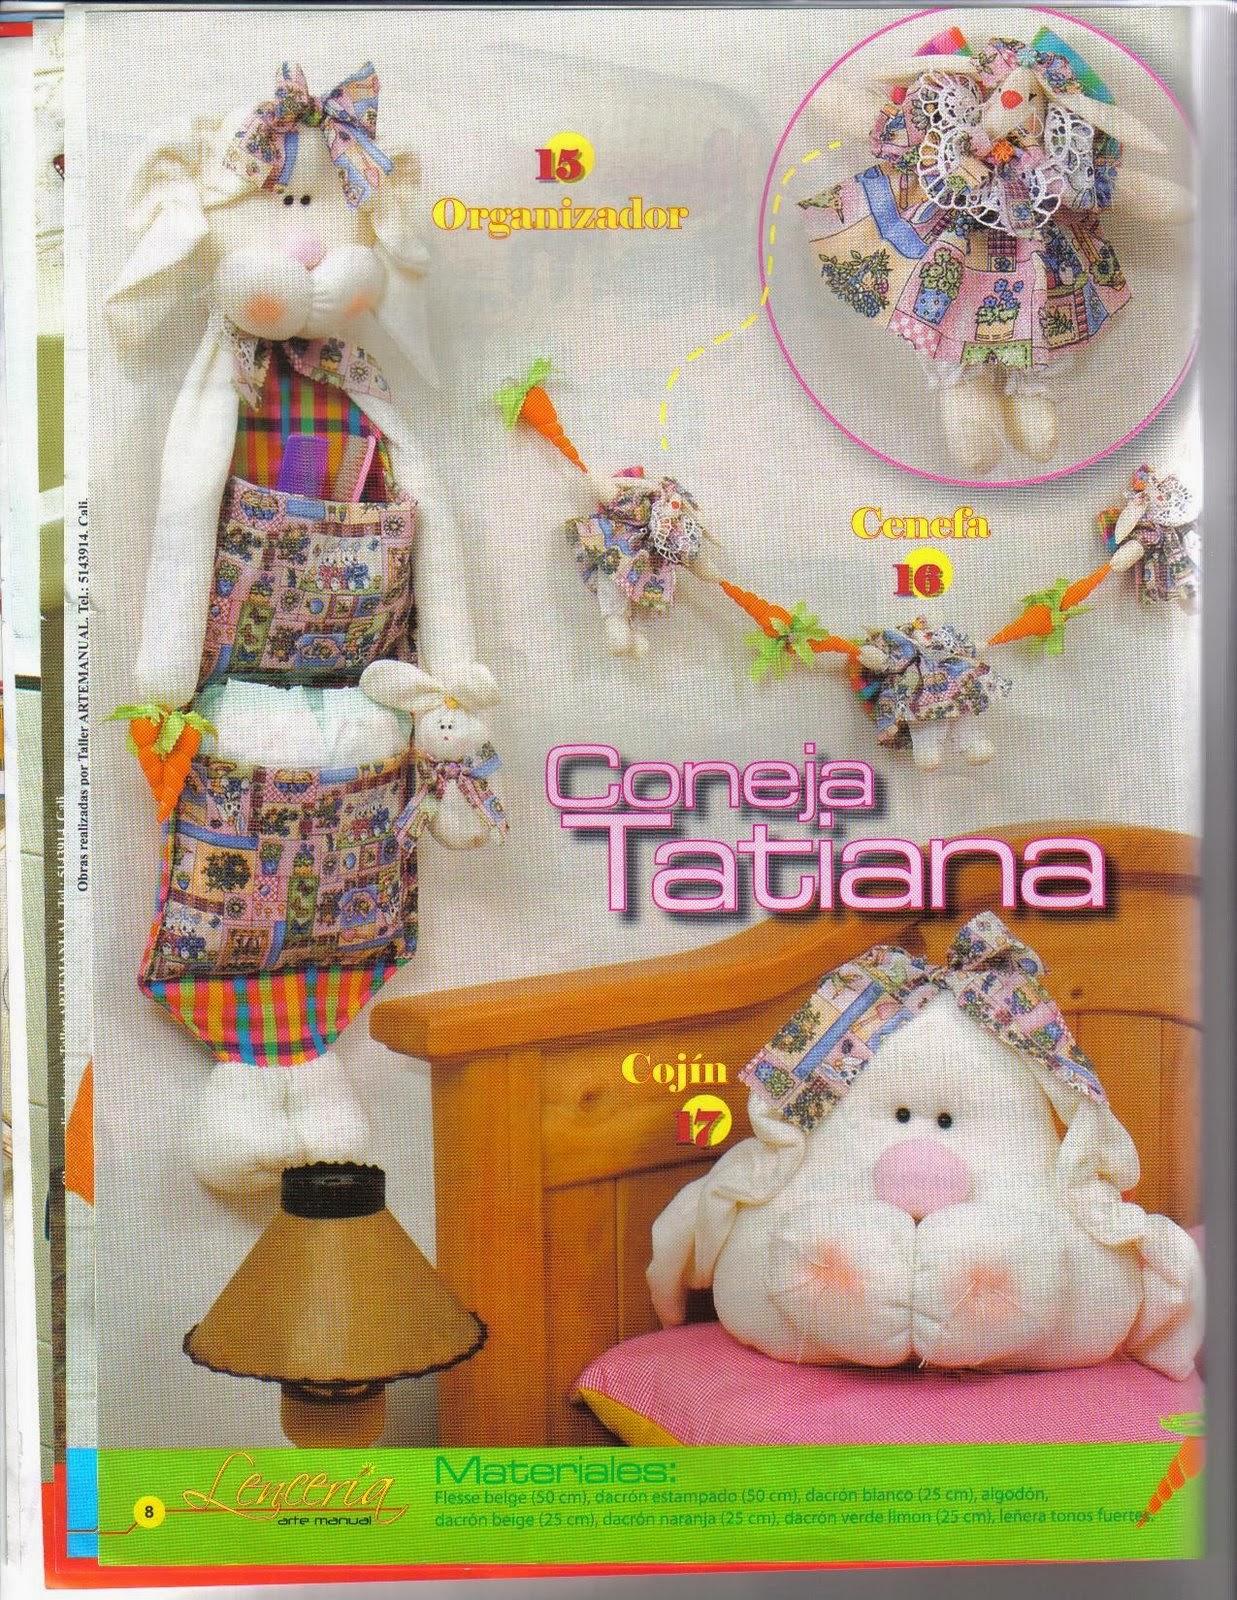 Album Picasa Lenceria De Baño:Picasa Revistas De Lenceria Para El Hogar